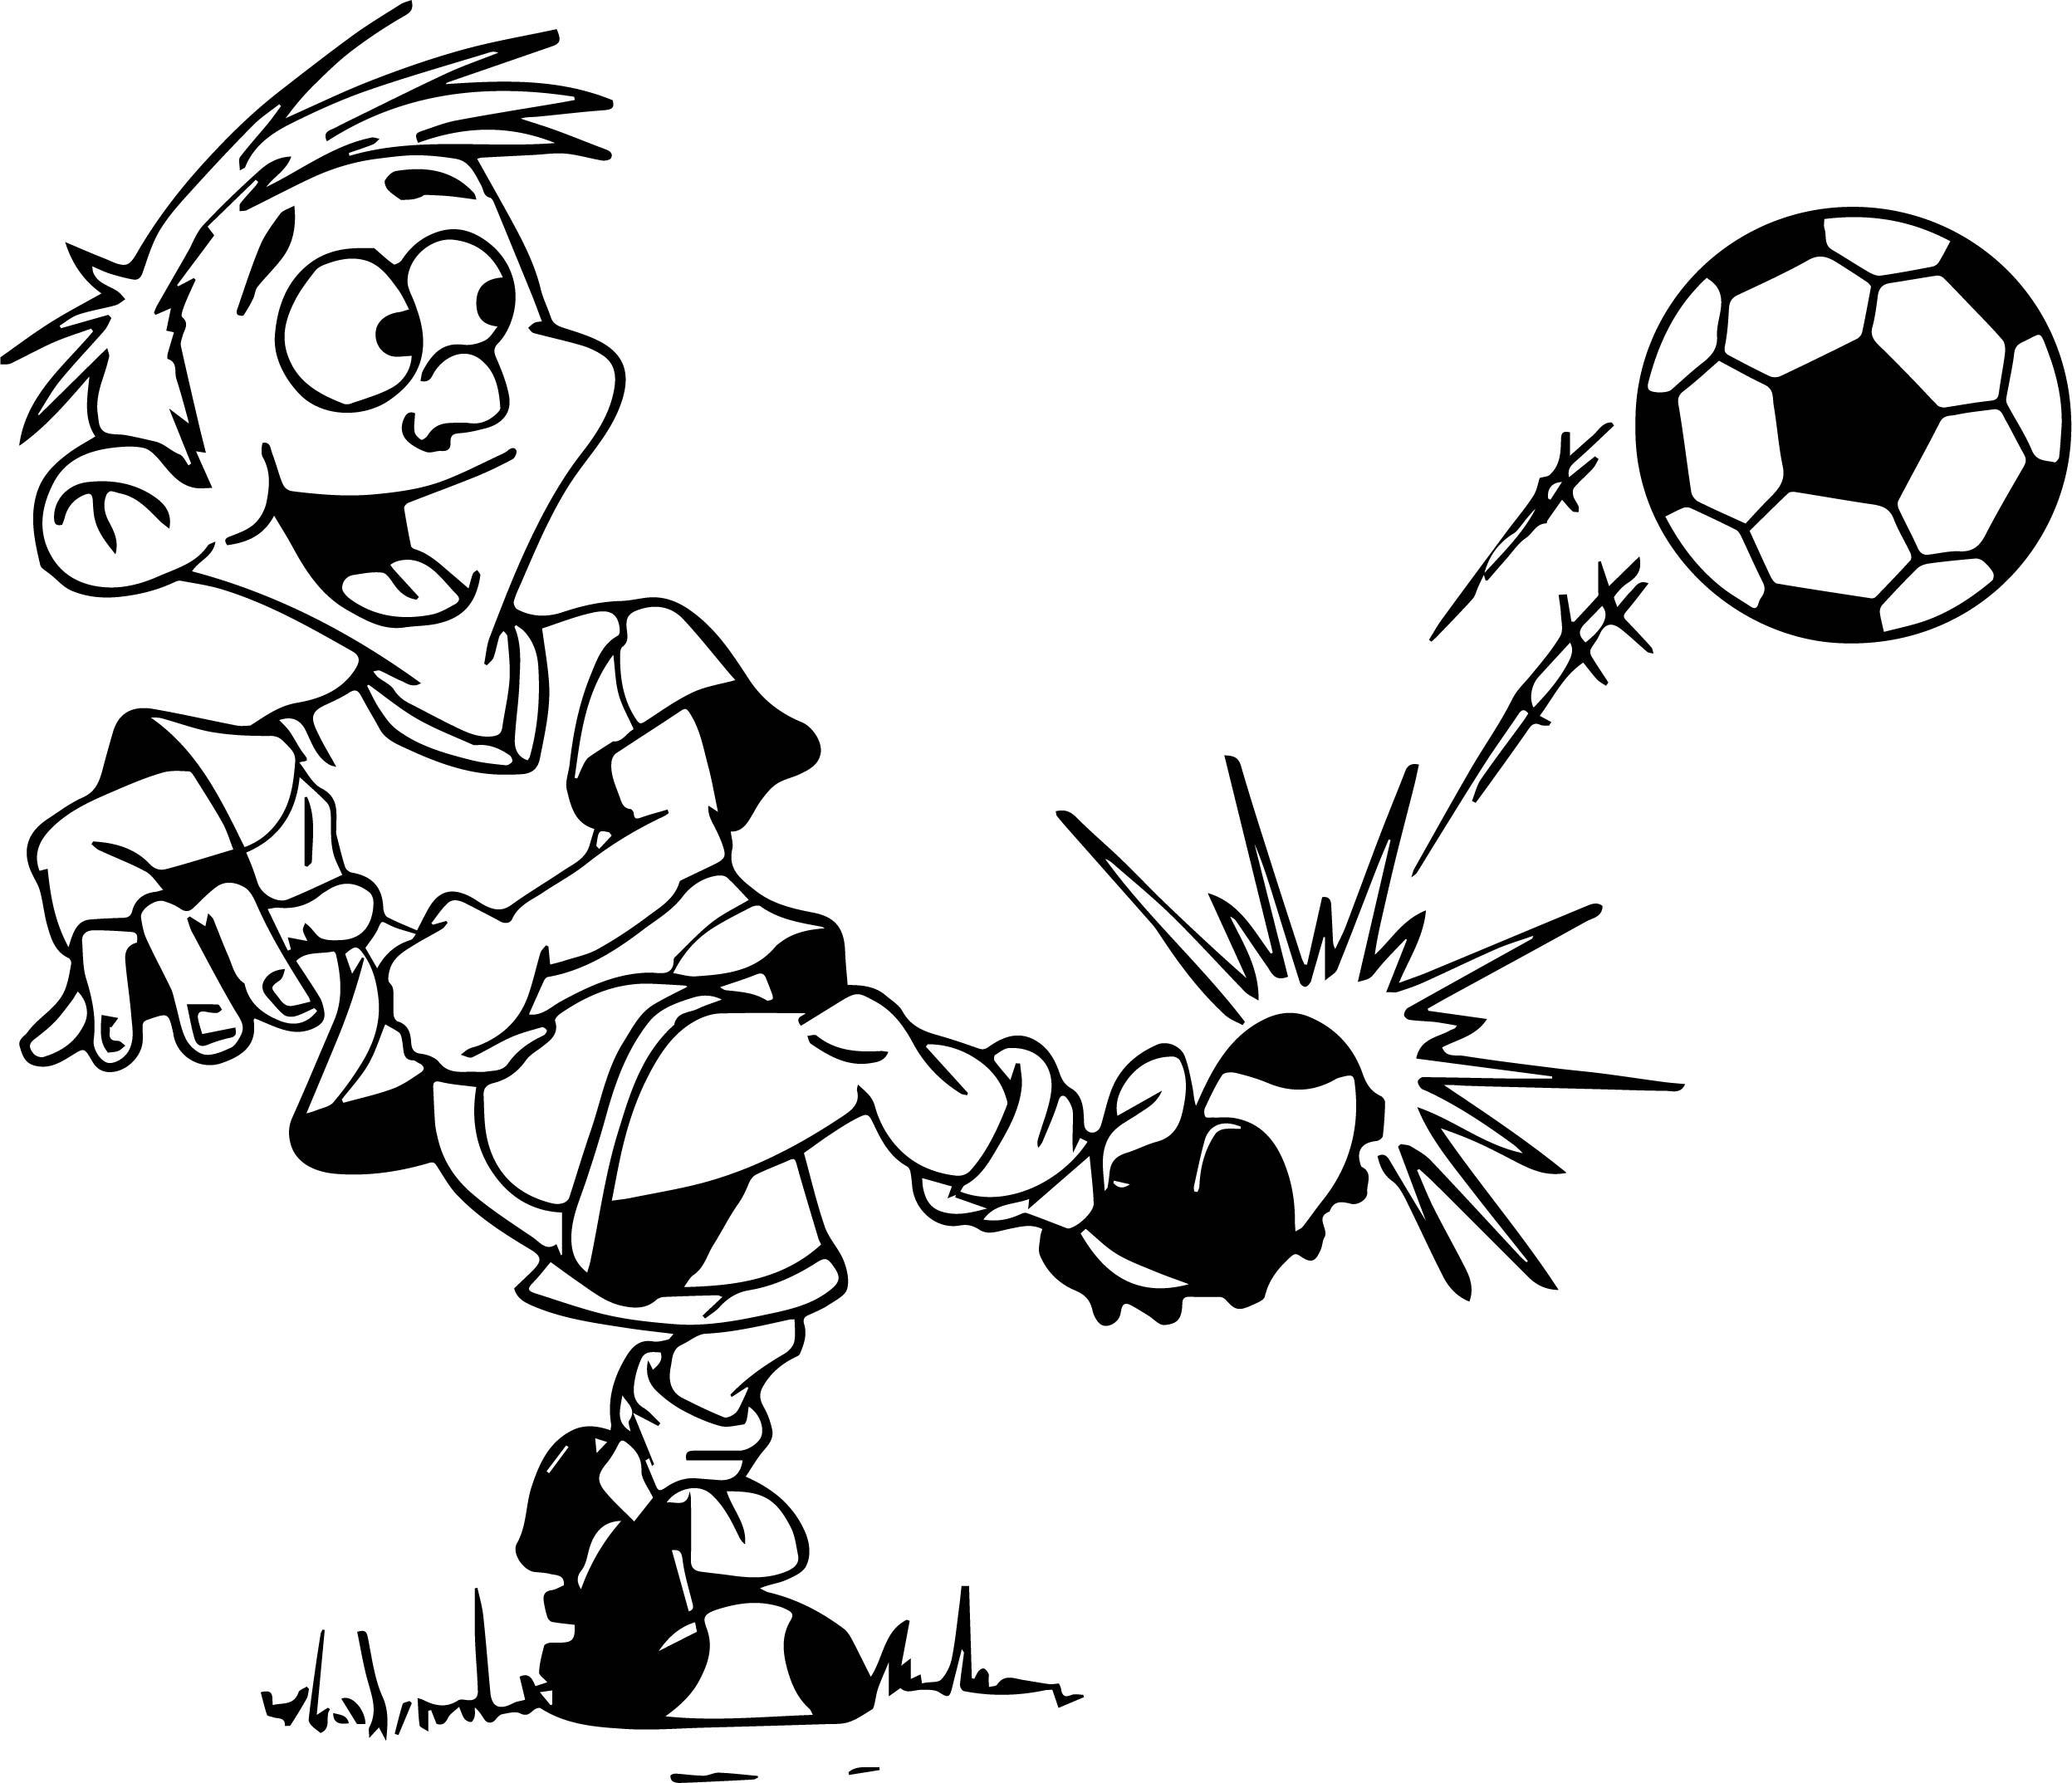 2495x2147 Kick A Ball Kids Playing Football Coloring Page Wecoloringpage